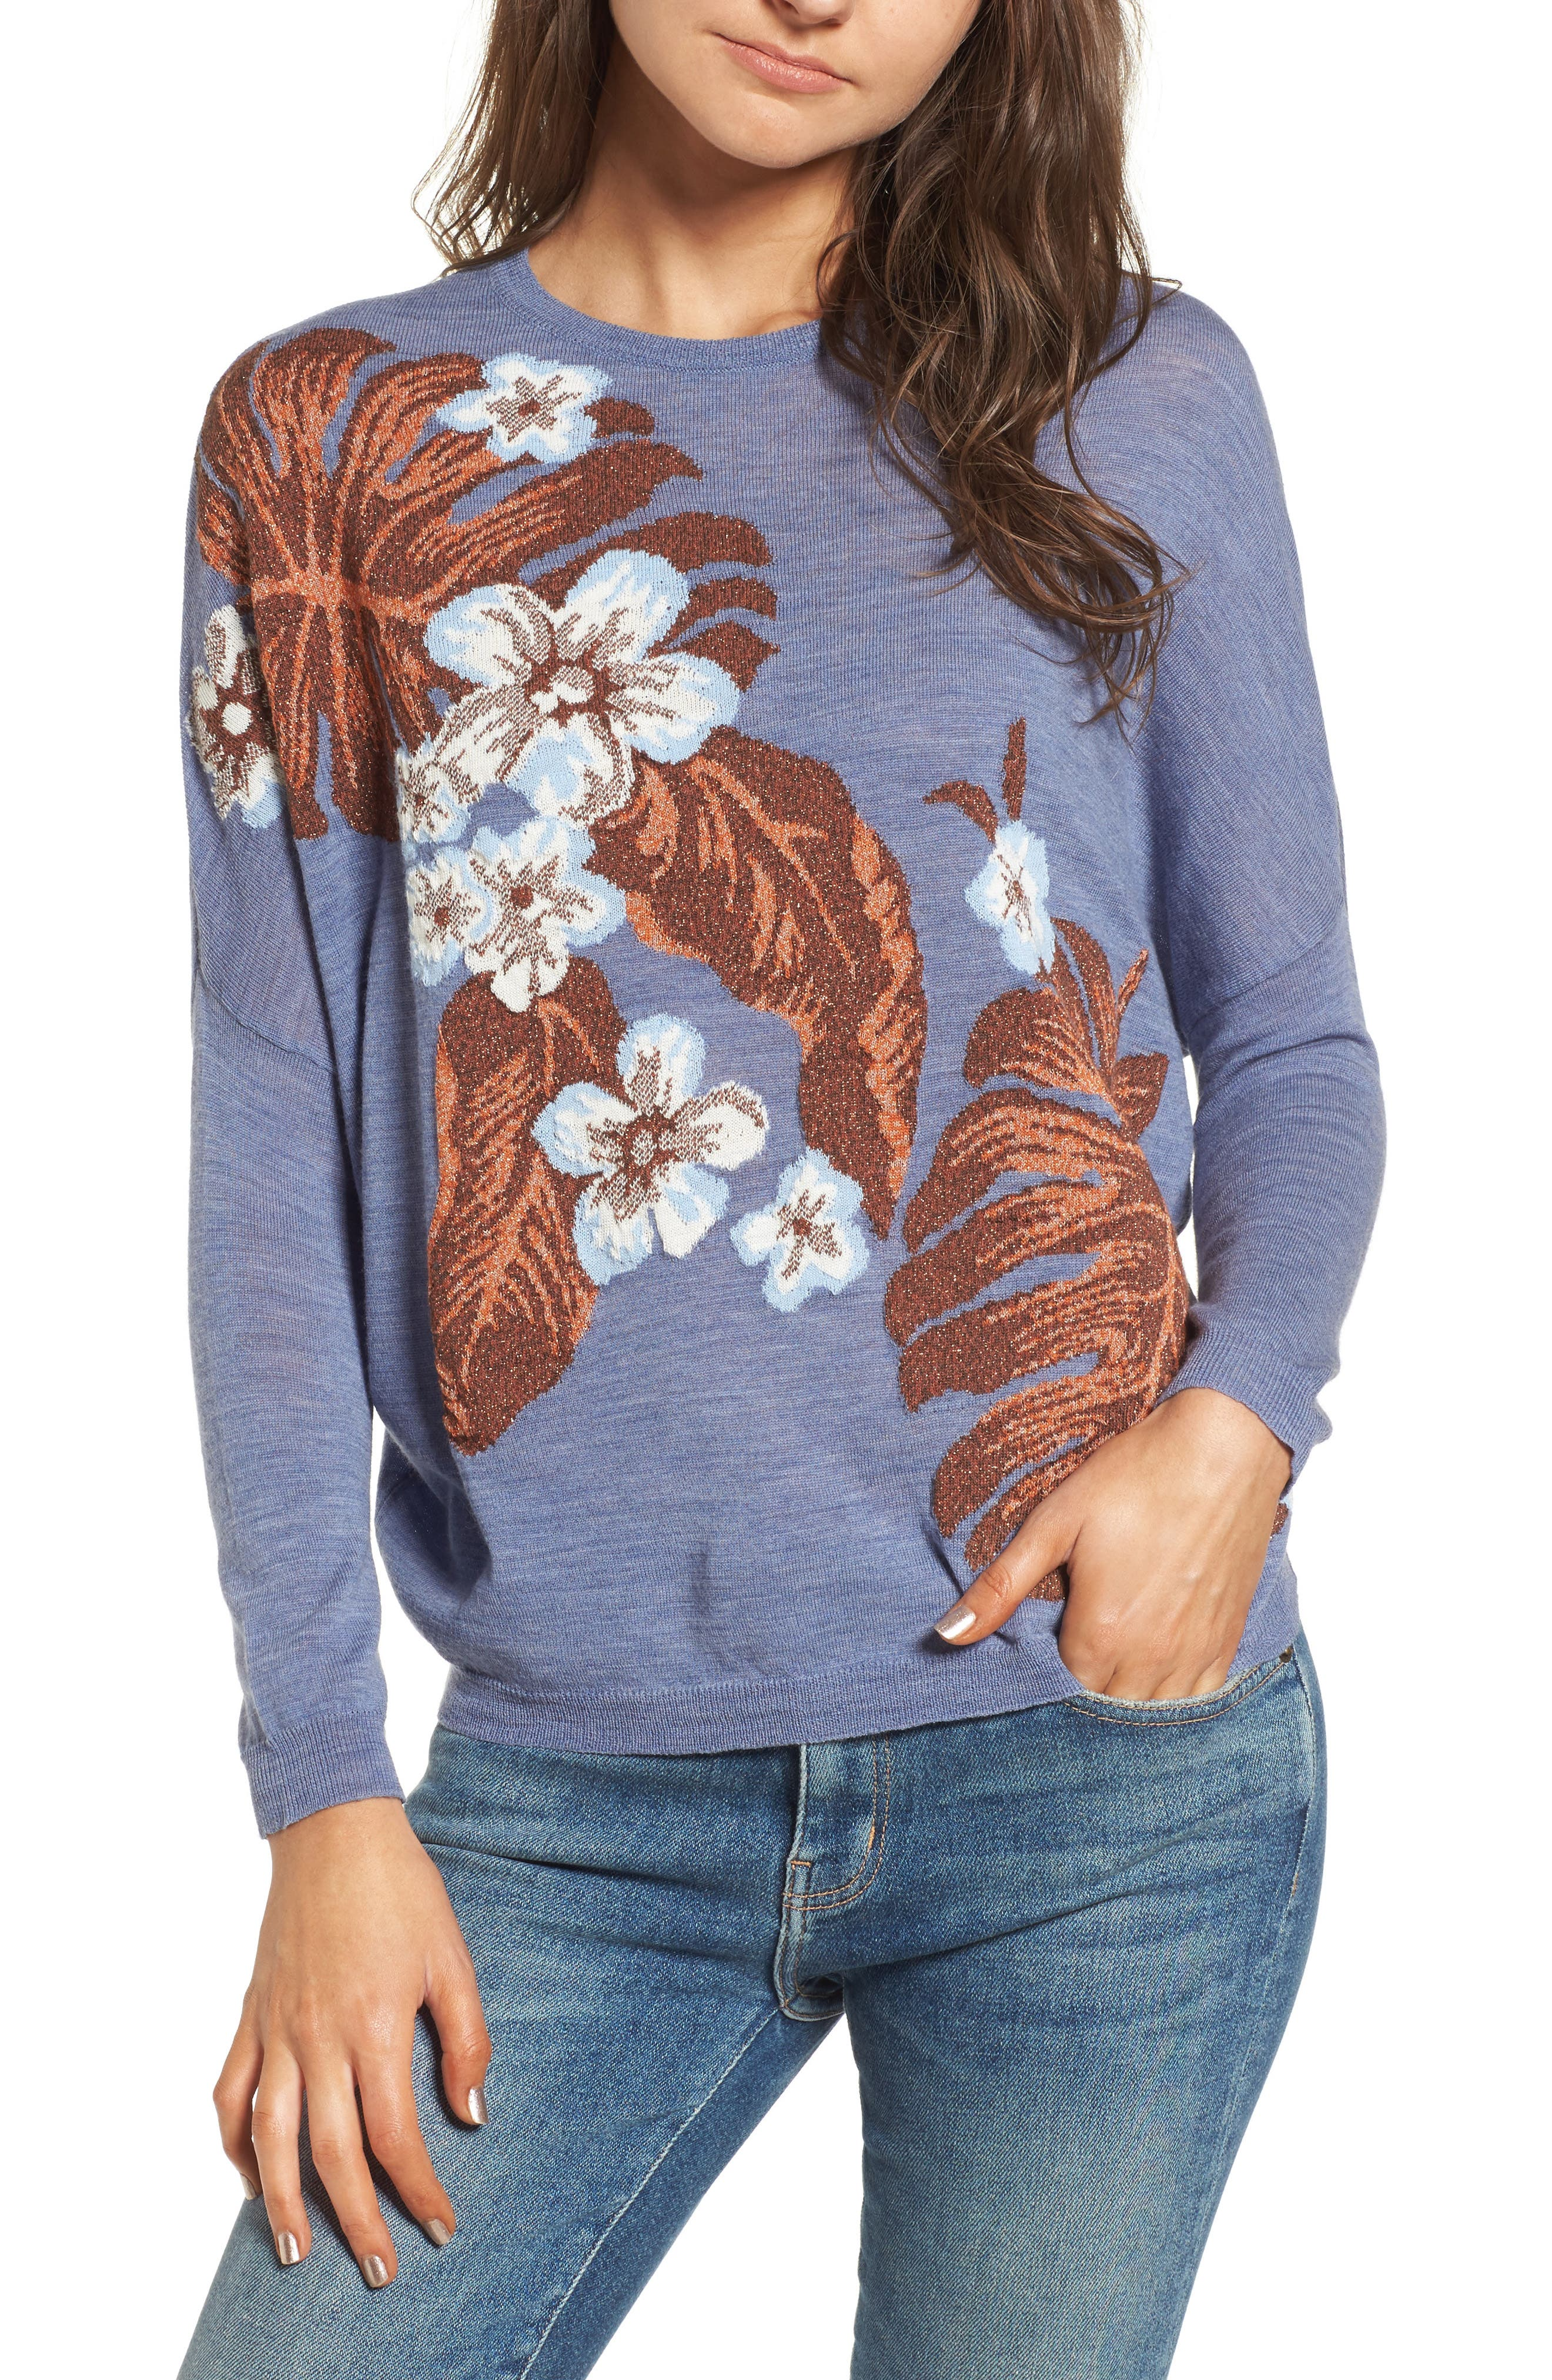 Blupalm Sweater,                             Main thumbnail 1, color,